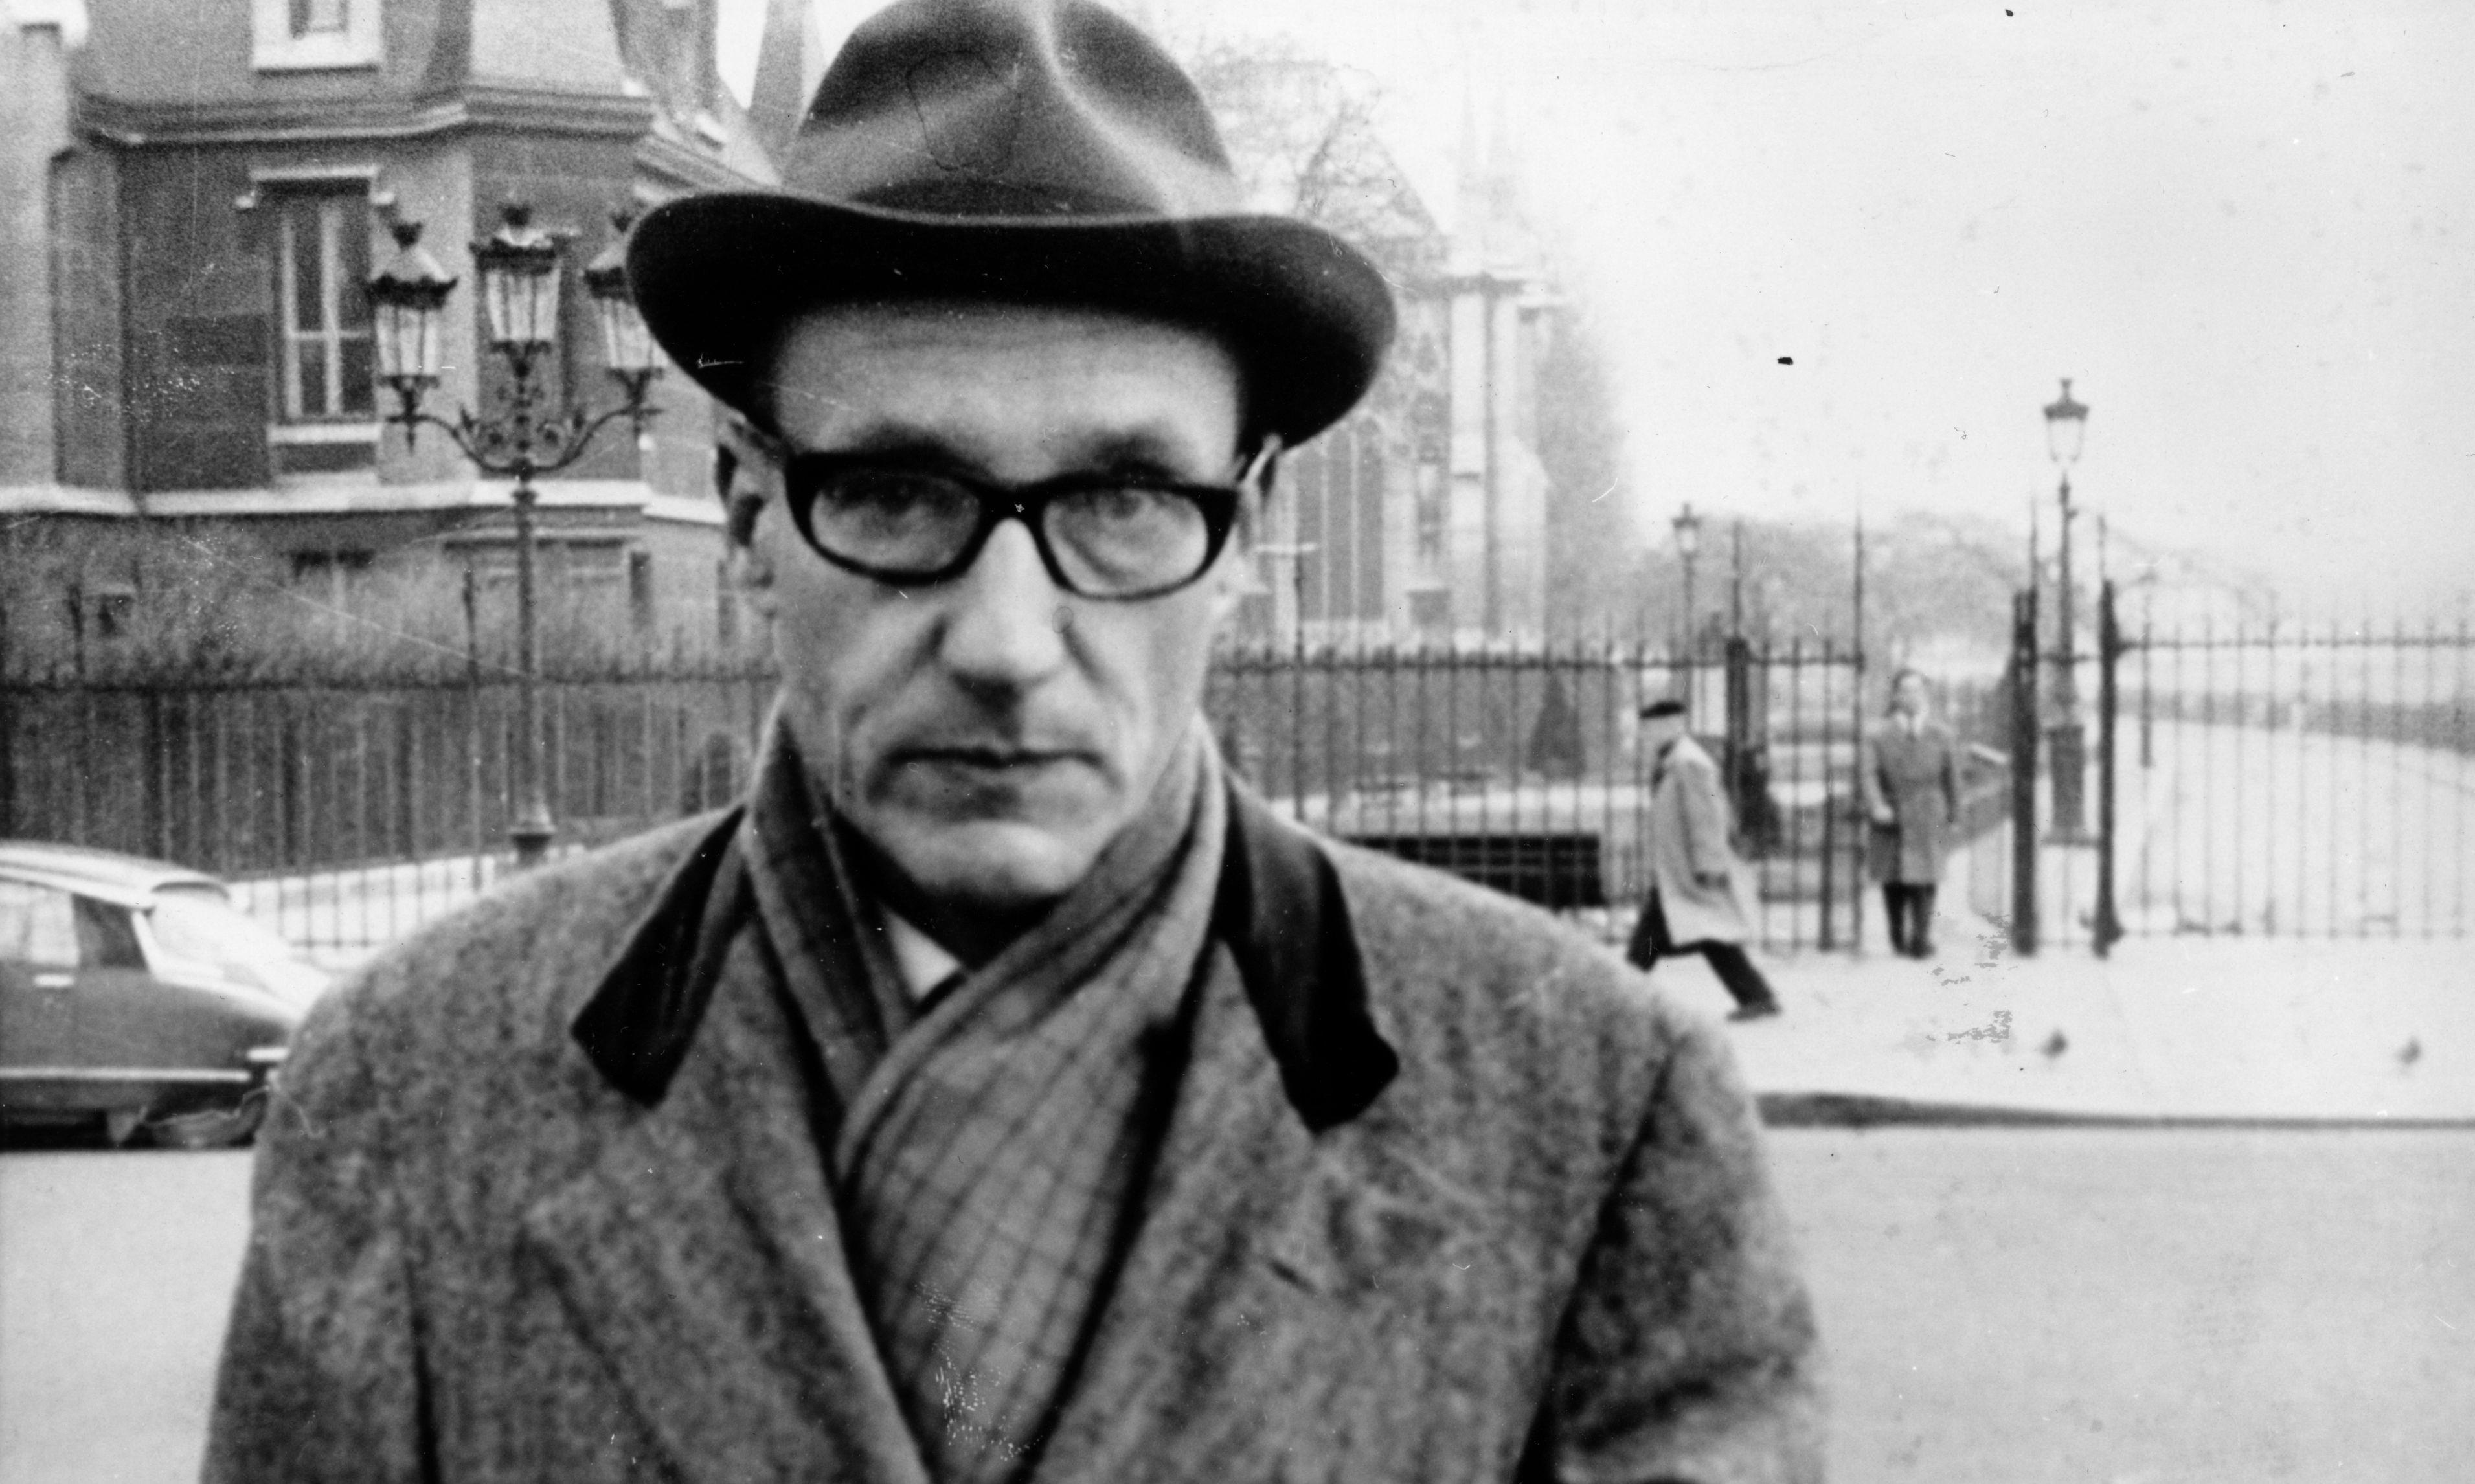 The elusive William Burroughs – archive, 10 September 1965